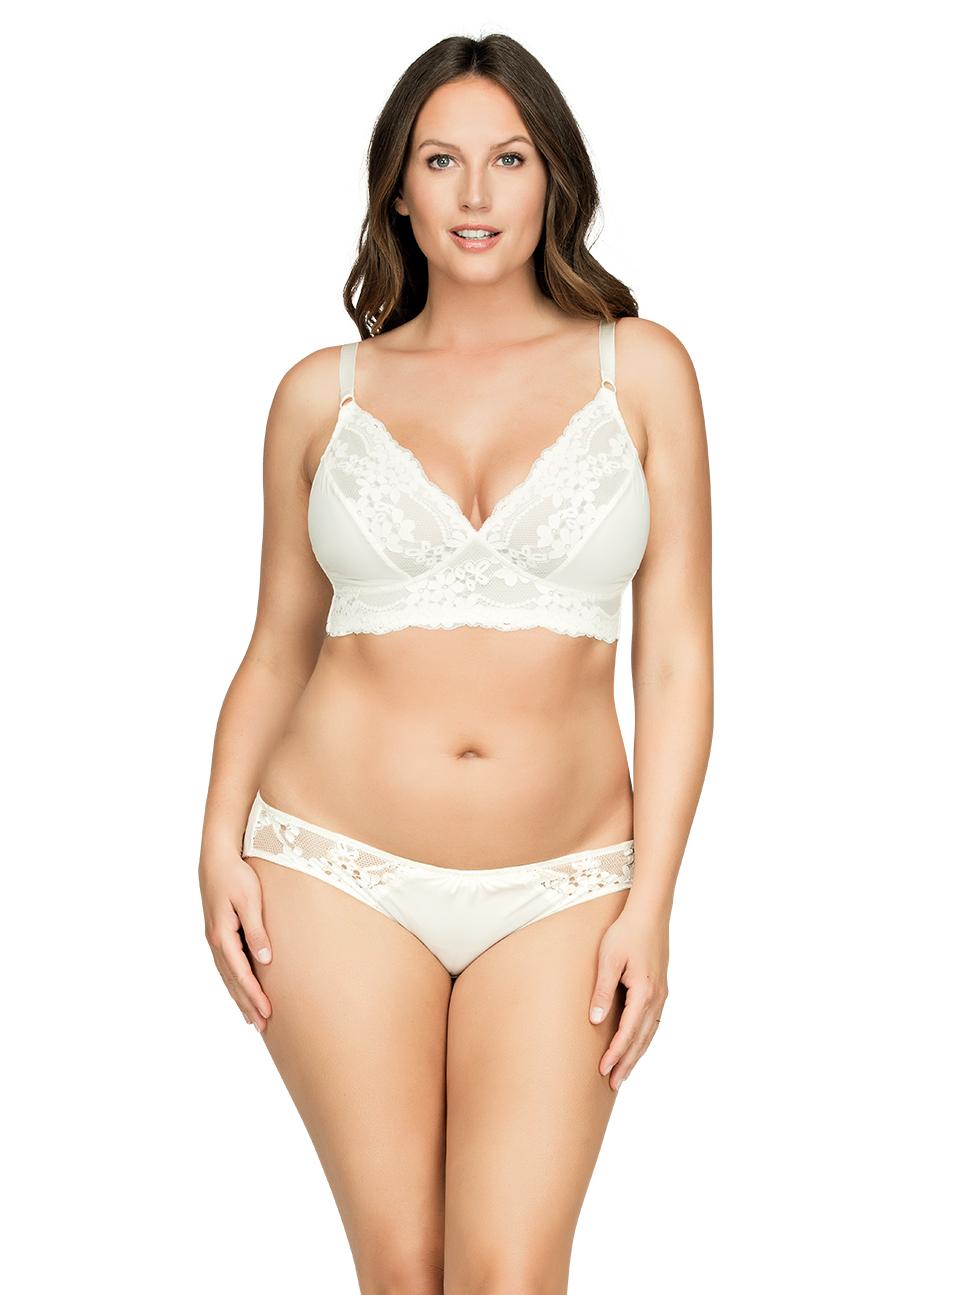 PARFAIT Ciara BraletteP5711 BikiniP5713 Ivory Front1 - Ciara Bikini Ivory P5713